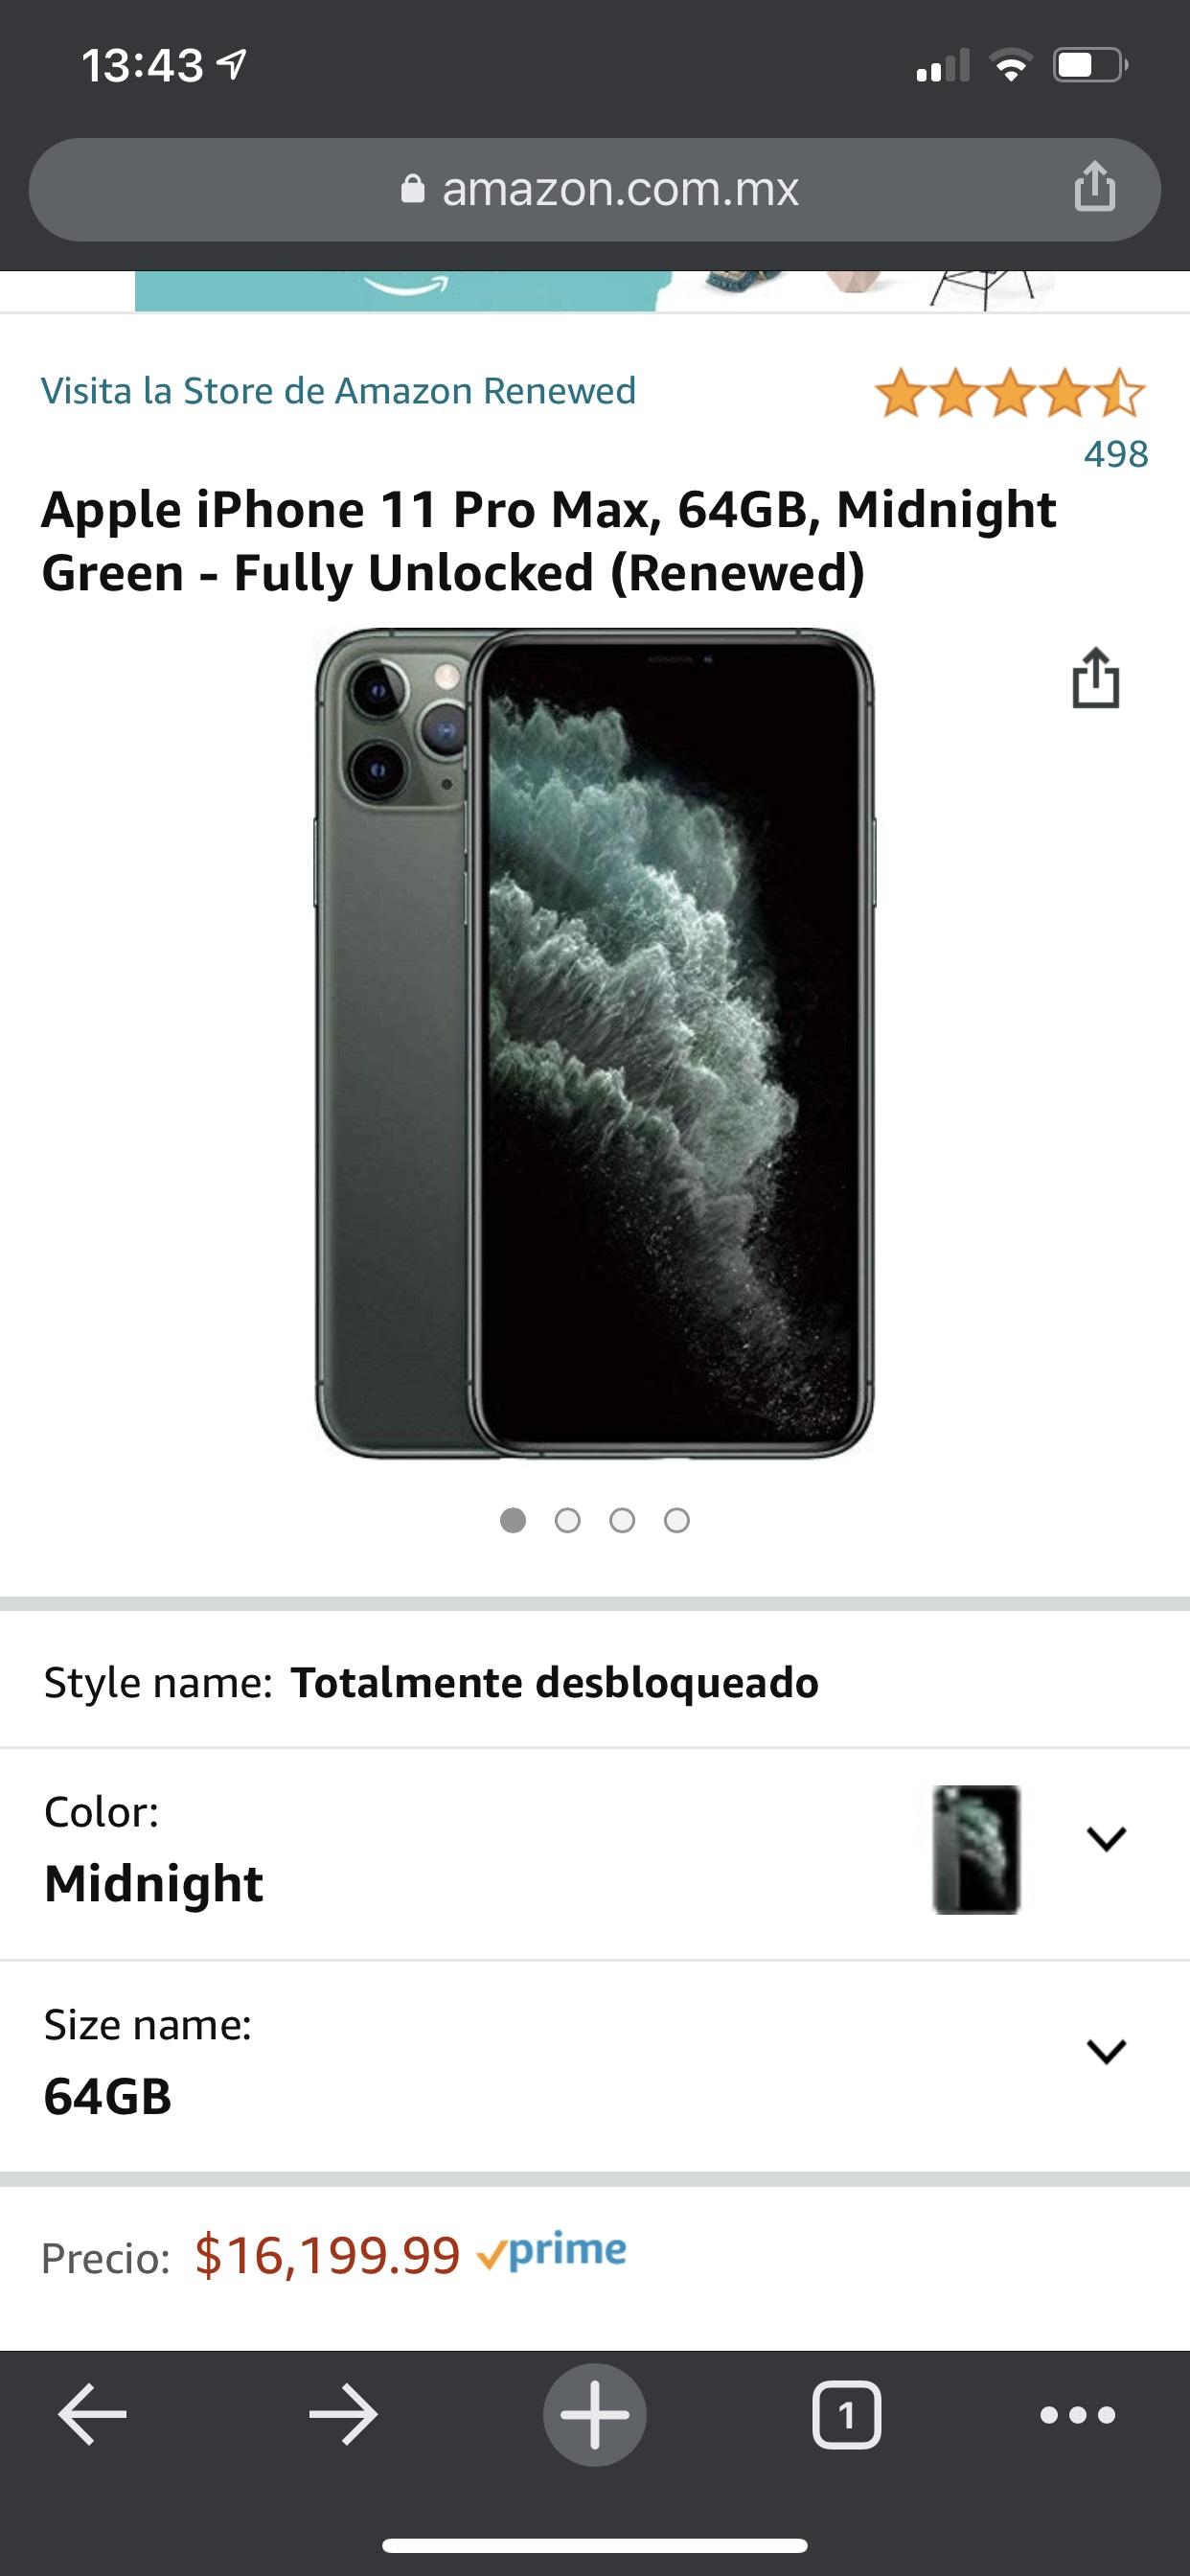 Amazon: Apple iPhone 11 Pro Max, 64GB, Midnight Green - Fully Unlocked (Renewed)